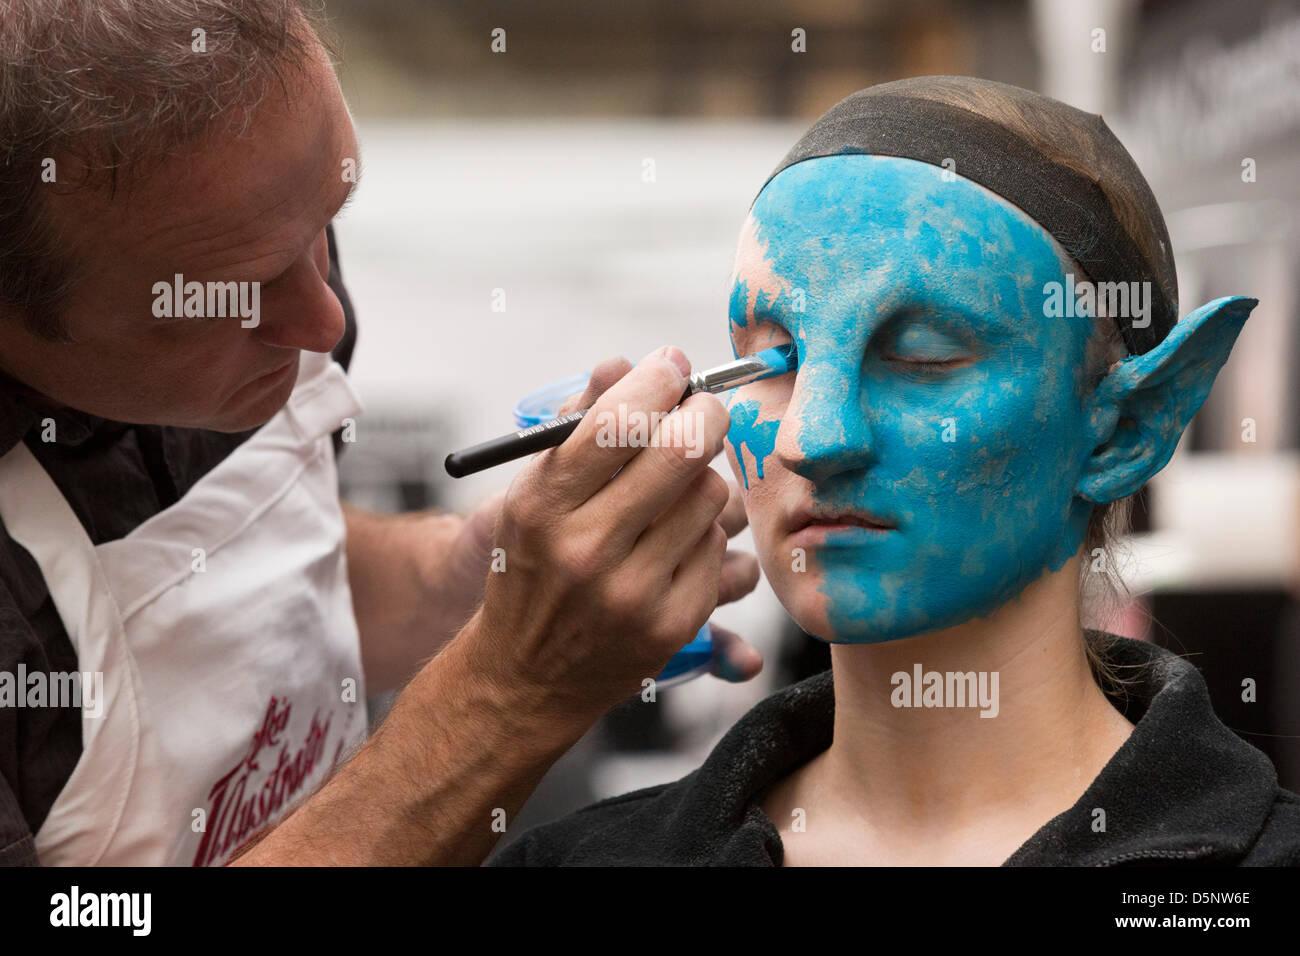 London, UK. 6. April 2013. UMA 2013, United Make-up Artists Expo findet im Business Design Centre in Islington, Stockbild